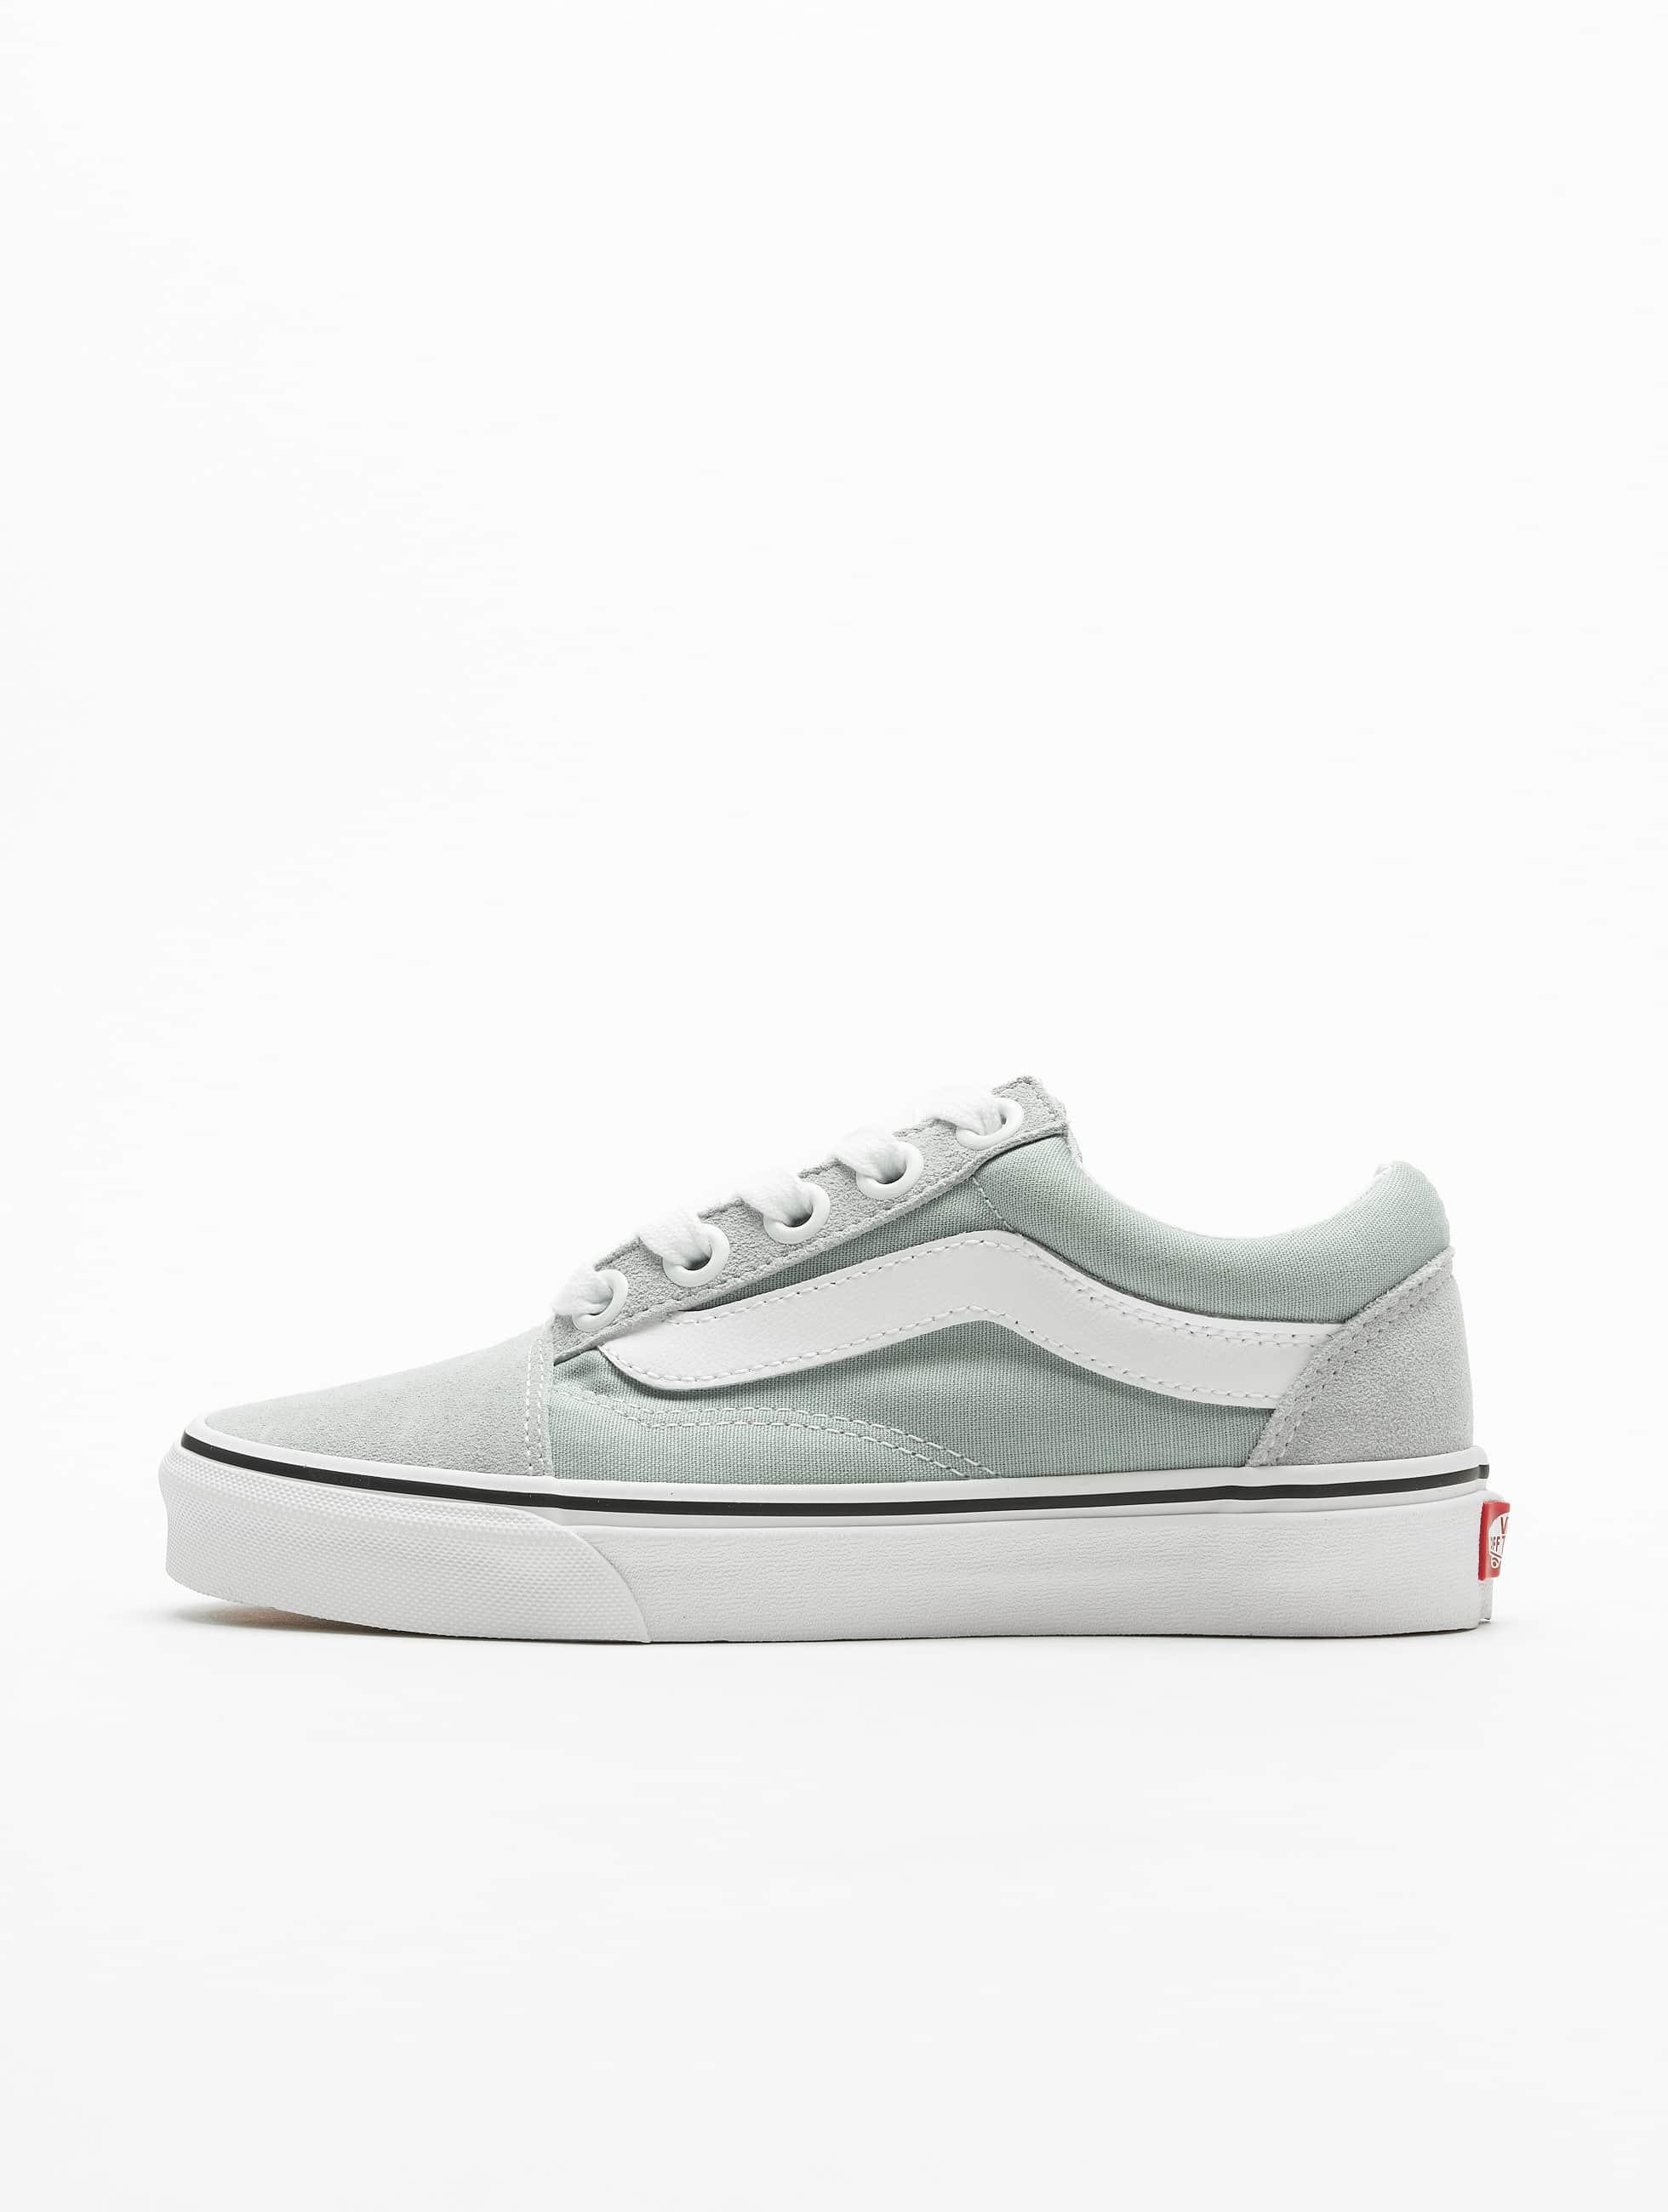 Vans Schuhe – Old Skool Neptune grünweiß